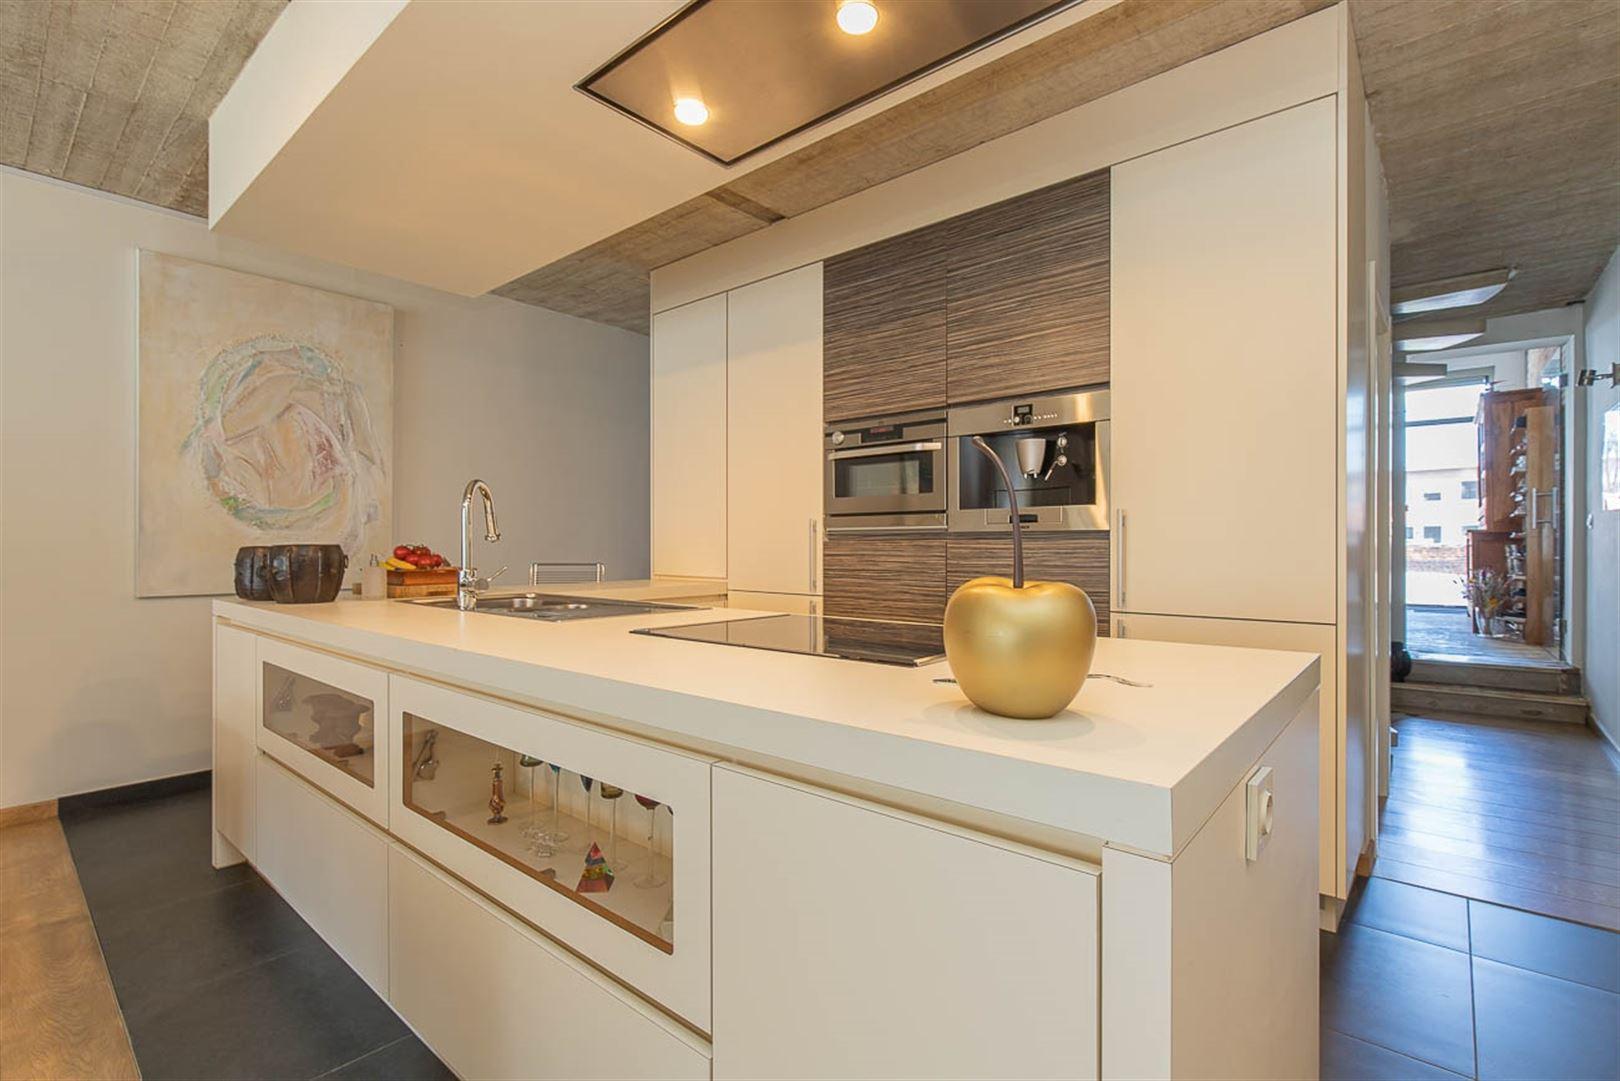 Foto 12 : Duplex/triplex te 9200 DENDERMONDE (België) - Prijs € 495.000